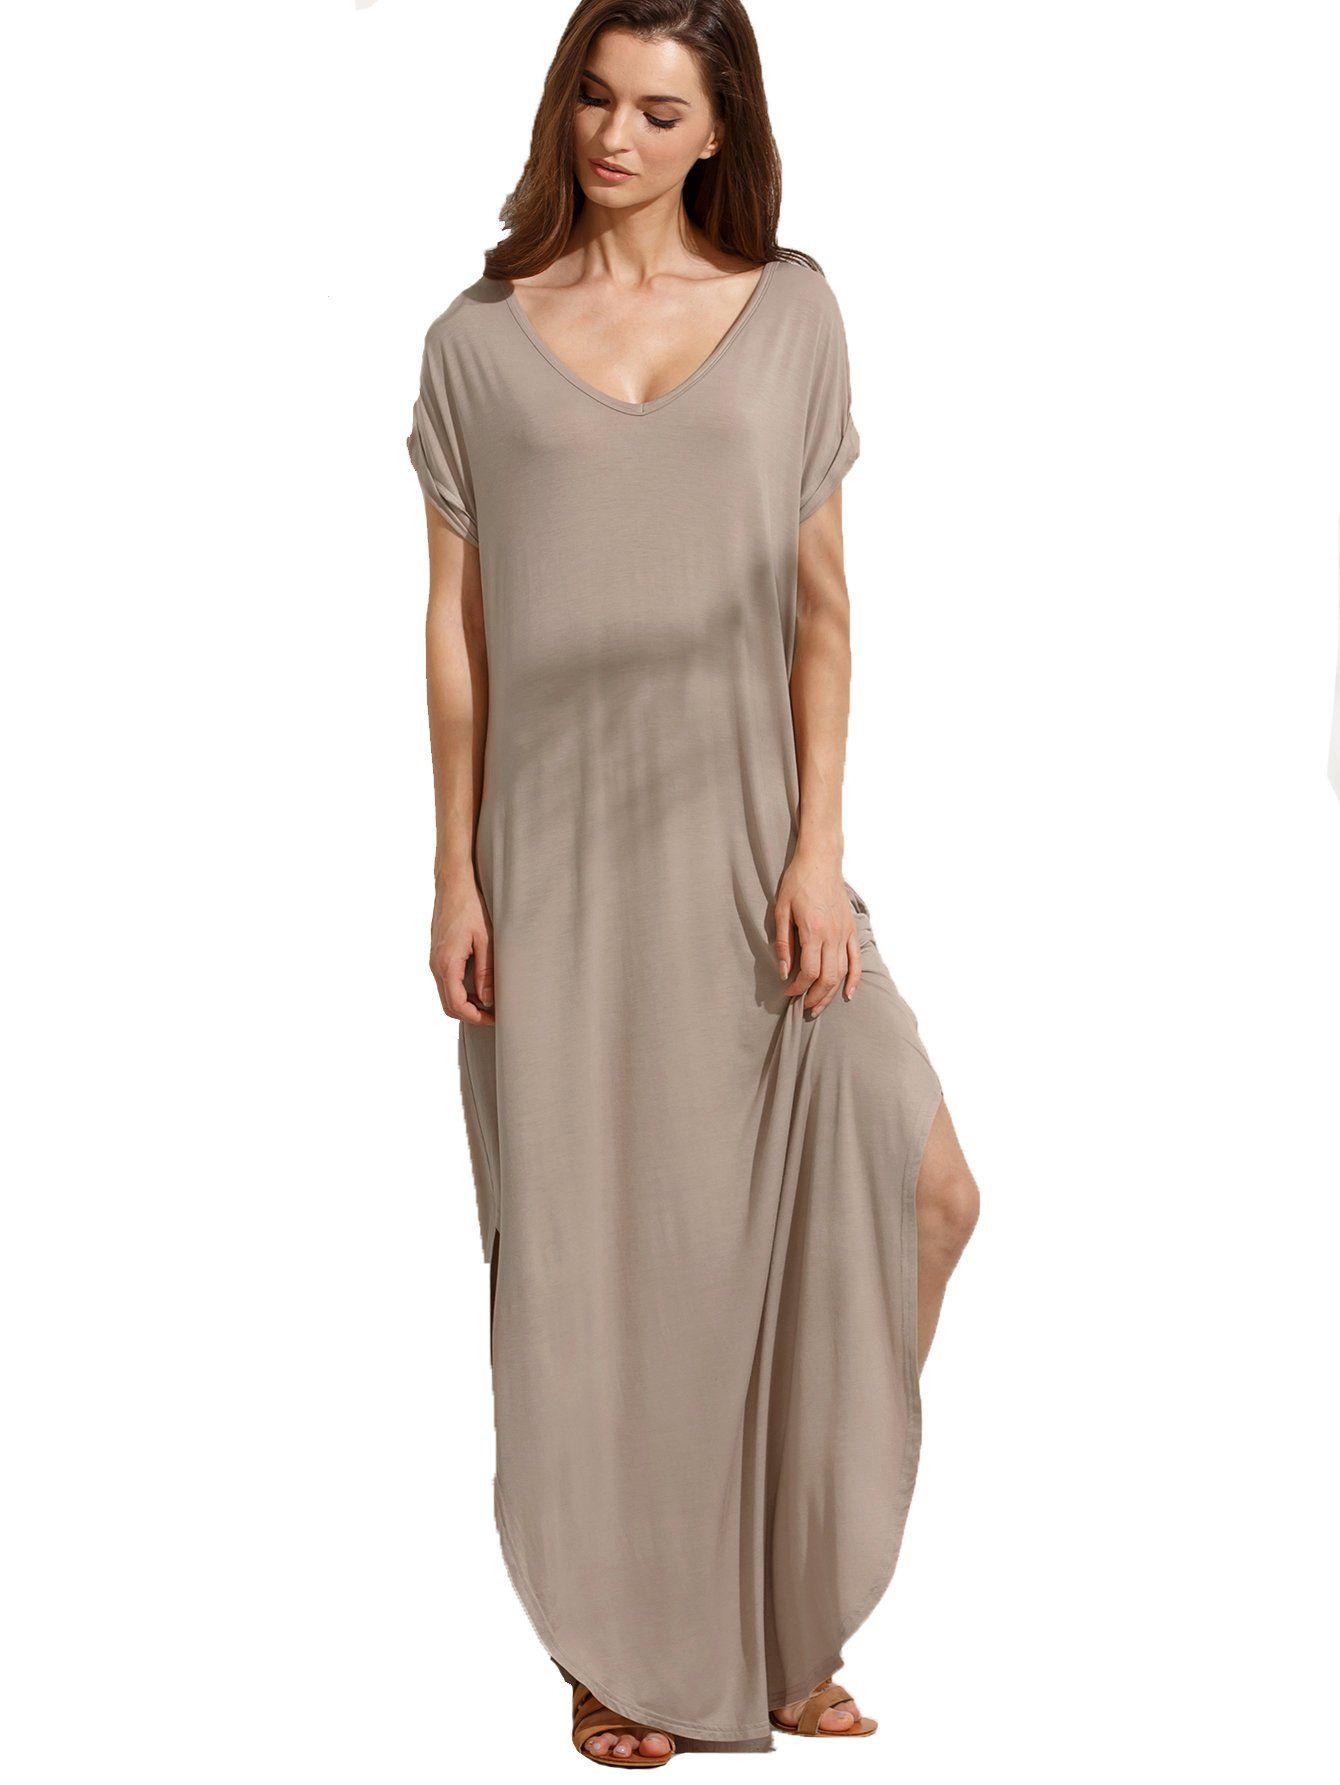 Verdusa womenus casual loose pocket shirt dress split shift long